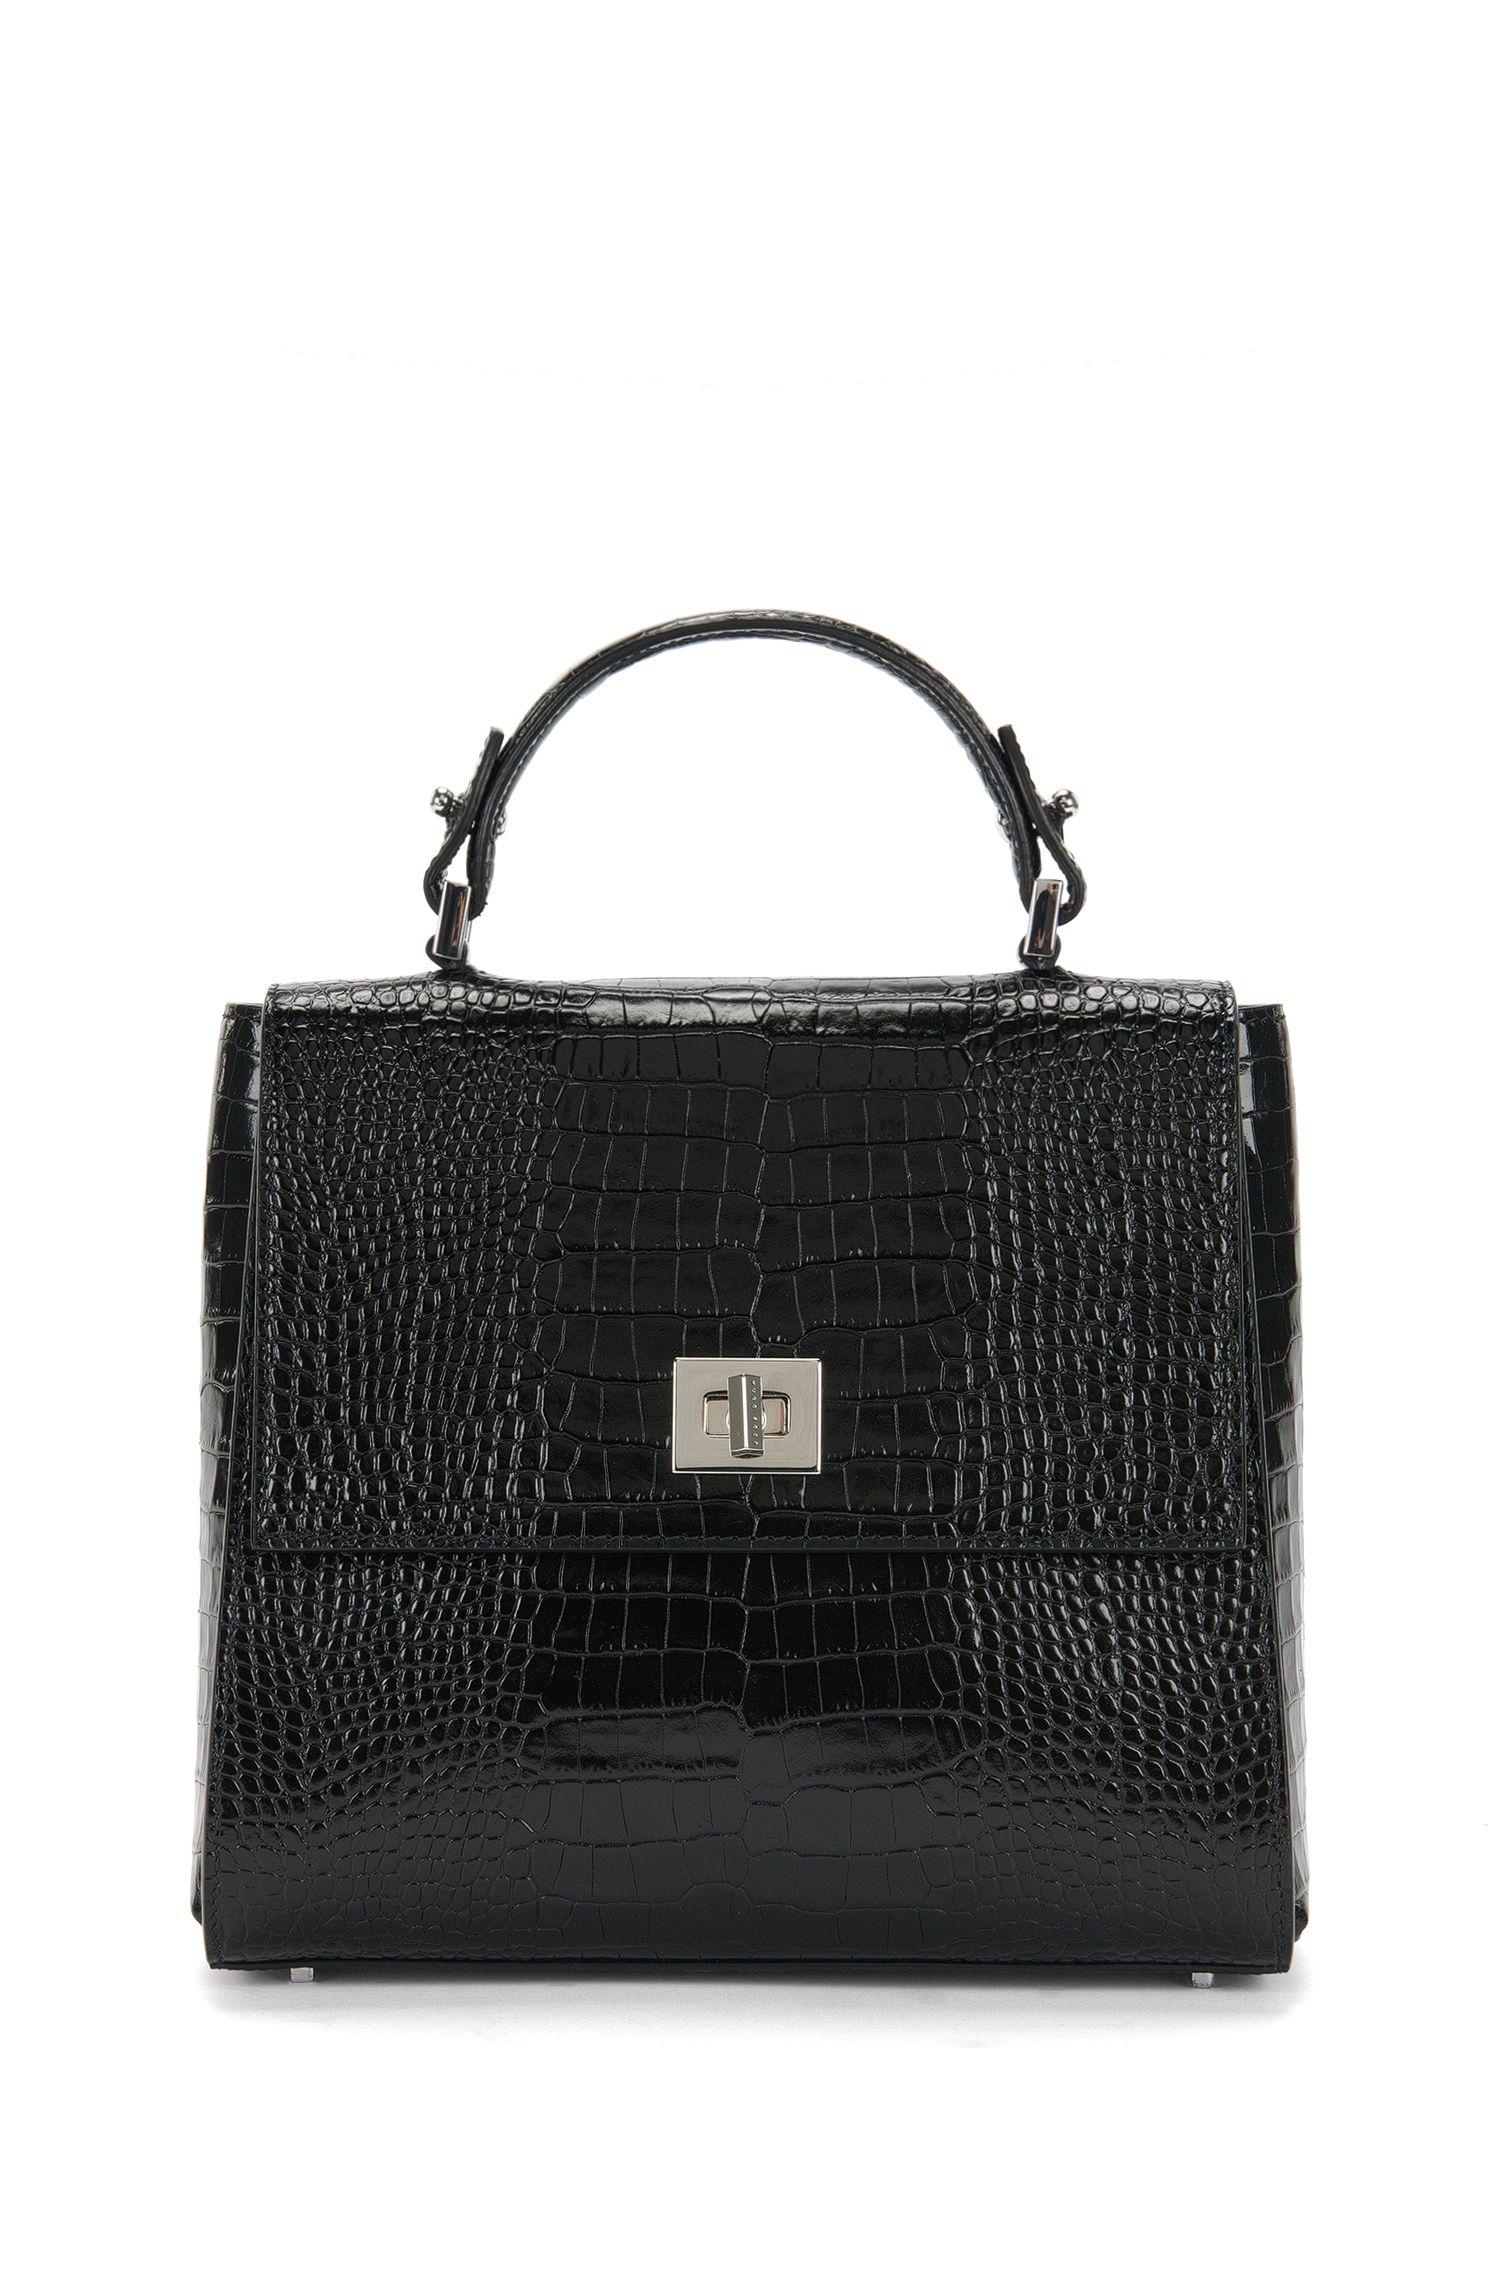 BOSS Bespoke Handtasche aus Leder mit Kroko-Print